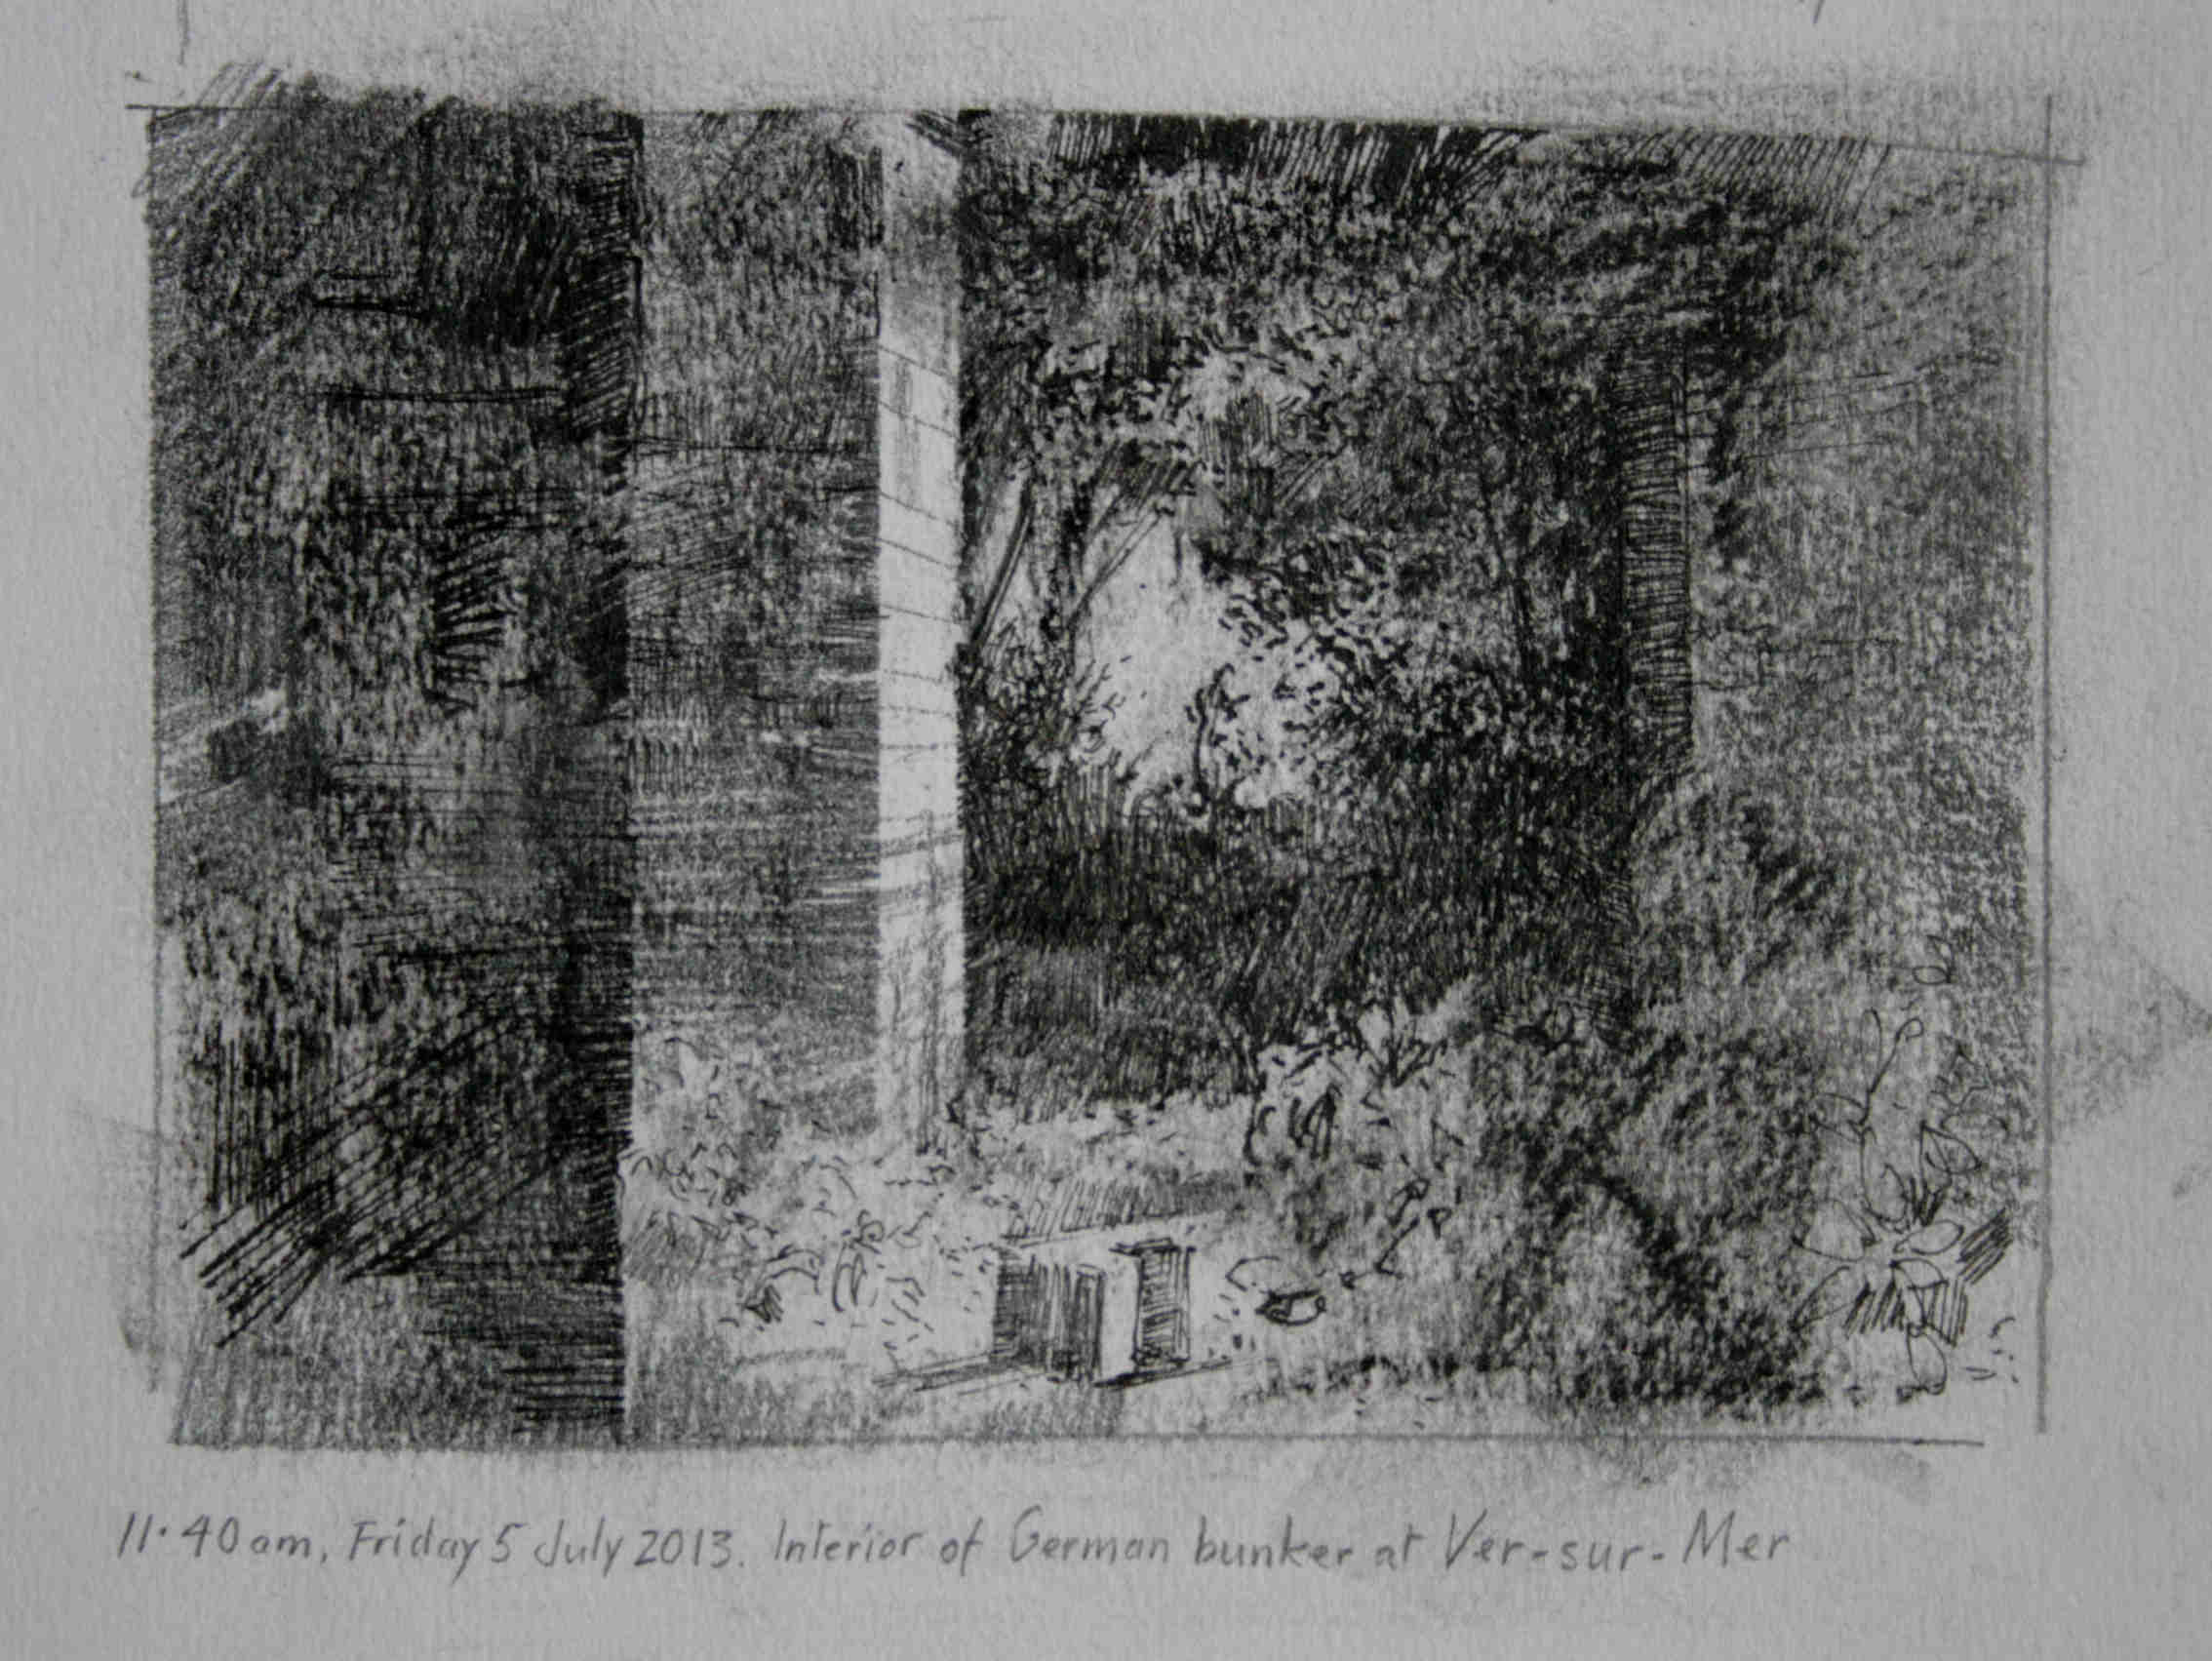 11.40am 5 July 2013. Interior of German Bunker at Ver-sur-Mer.